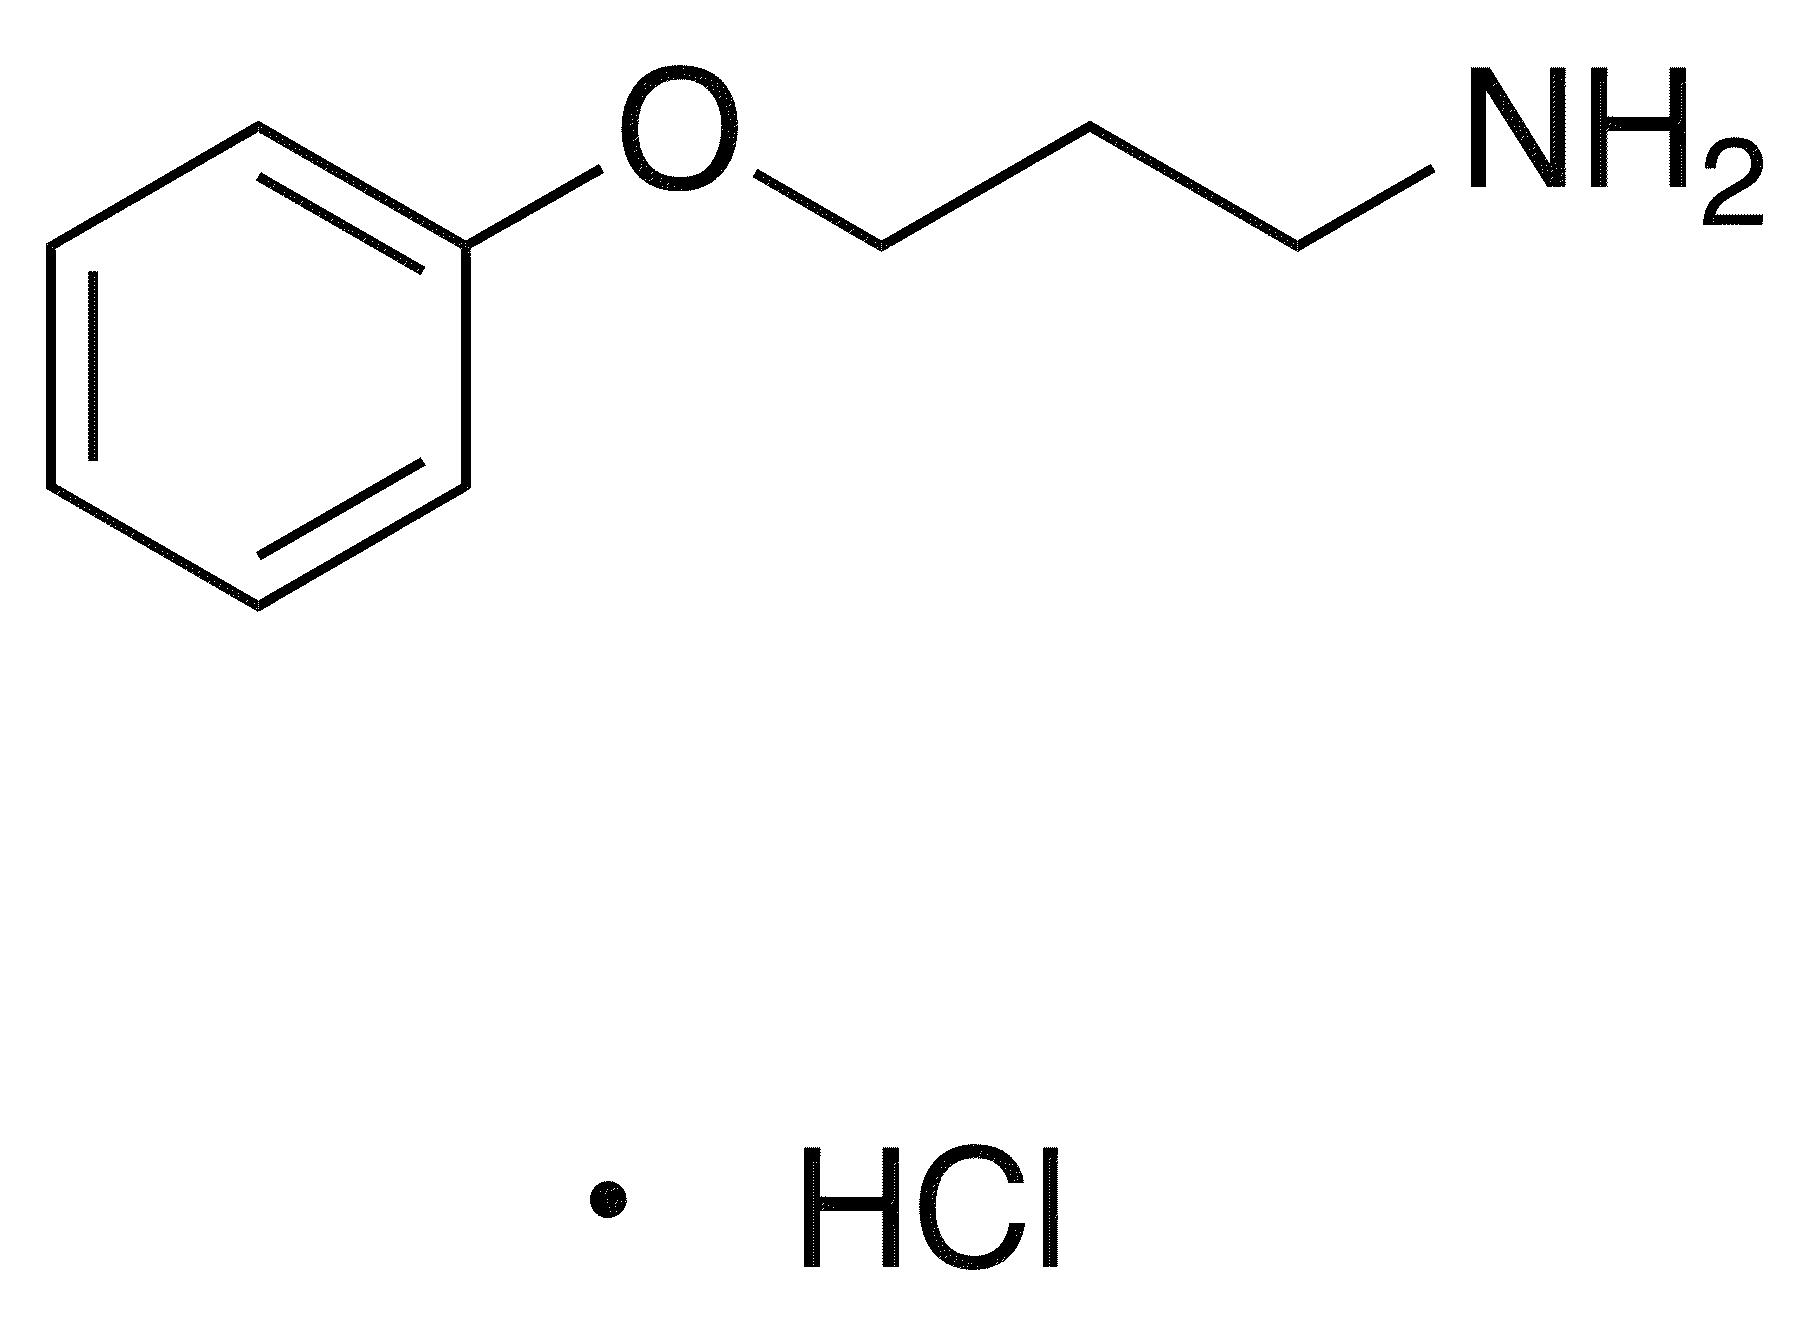 (3-Aminopropoxy)benzene Hydrochloride